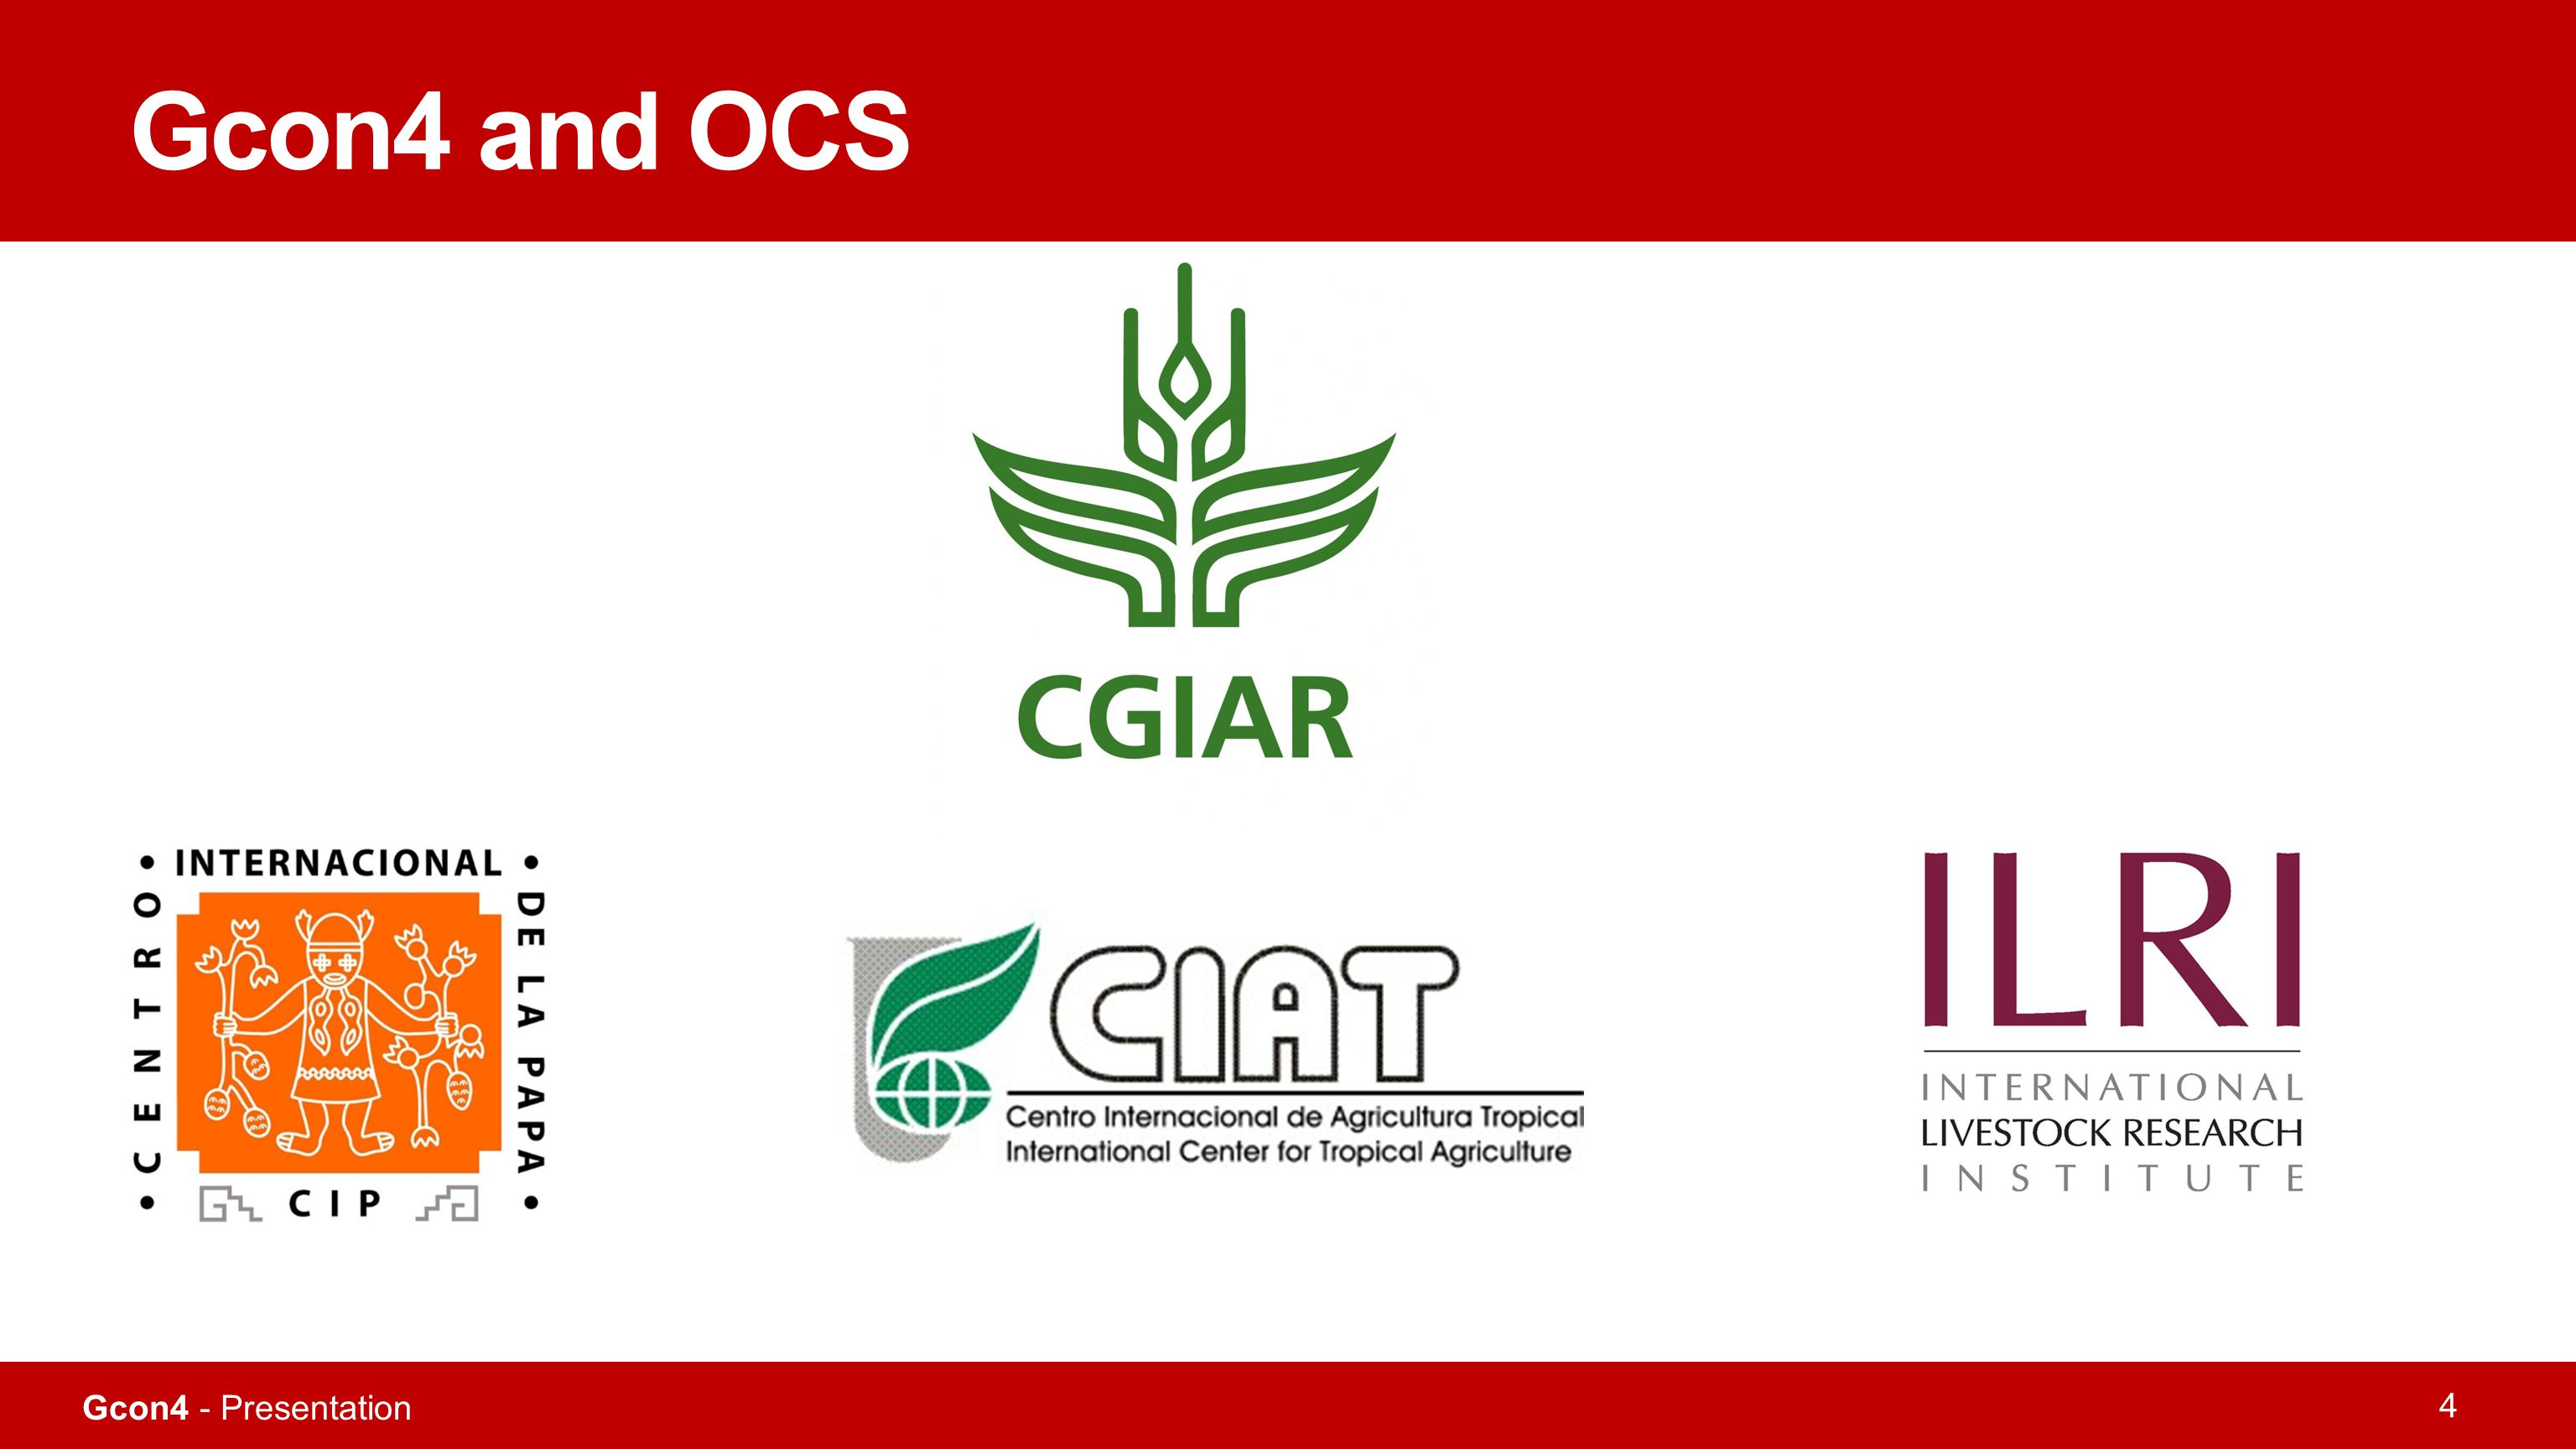 Gcon4 and OCS